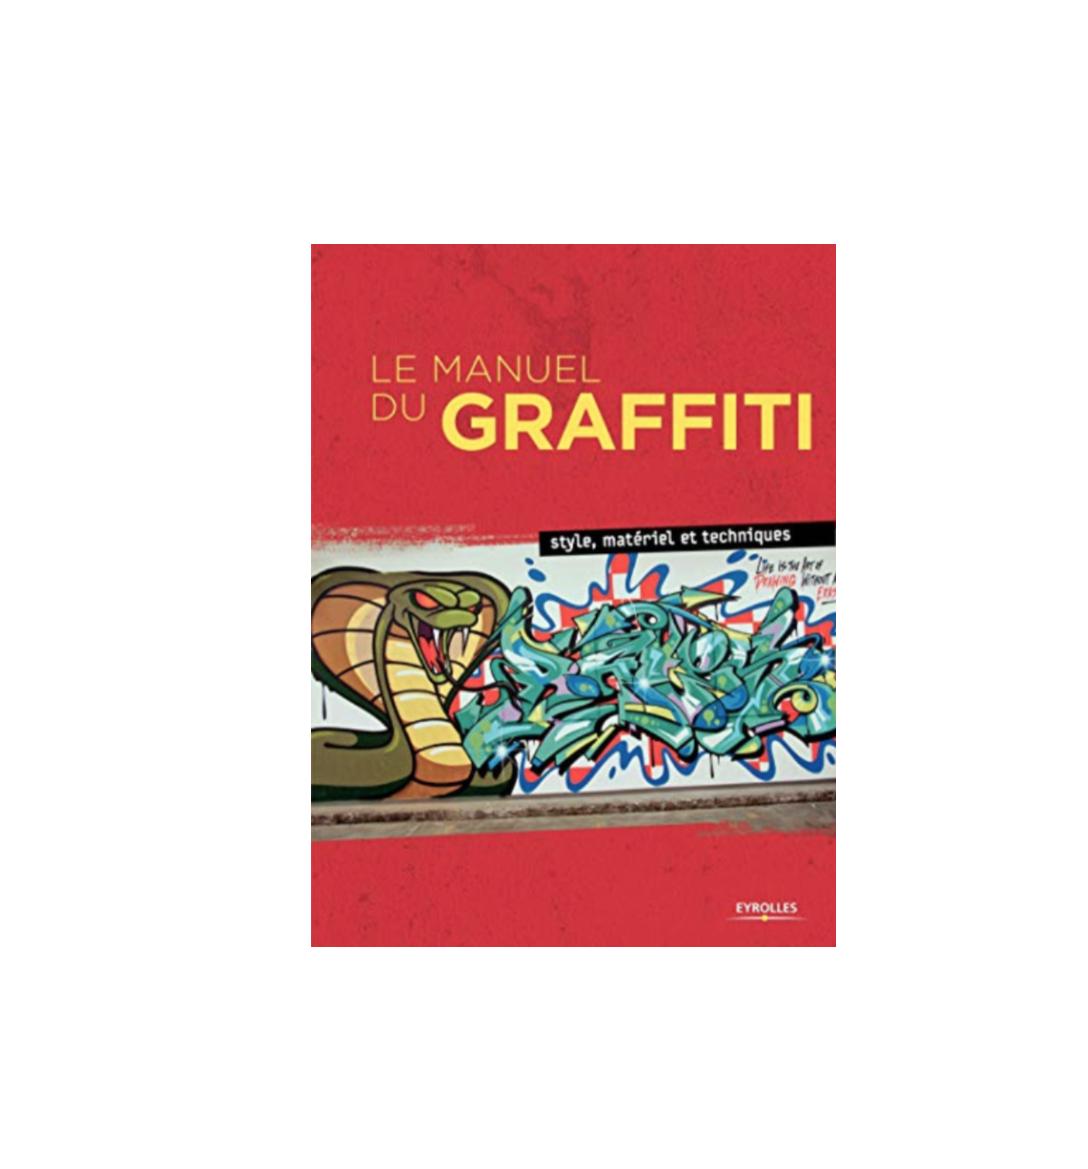 LE MANUEL DU GRAFFITI EYROLLES STREET ART VANDAL BOOK LIVRE  9782212139402 COMASOUND KARTEL CSK ONLINE   COLLECTOR